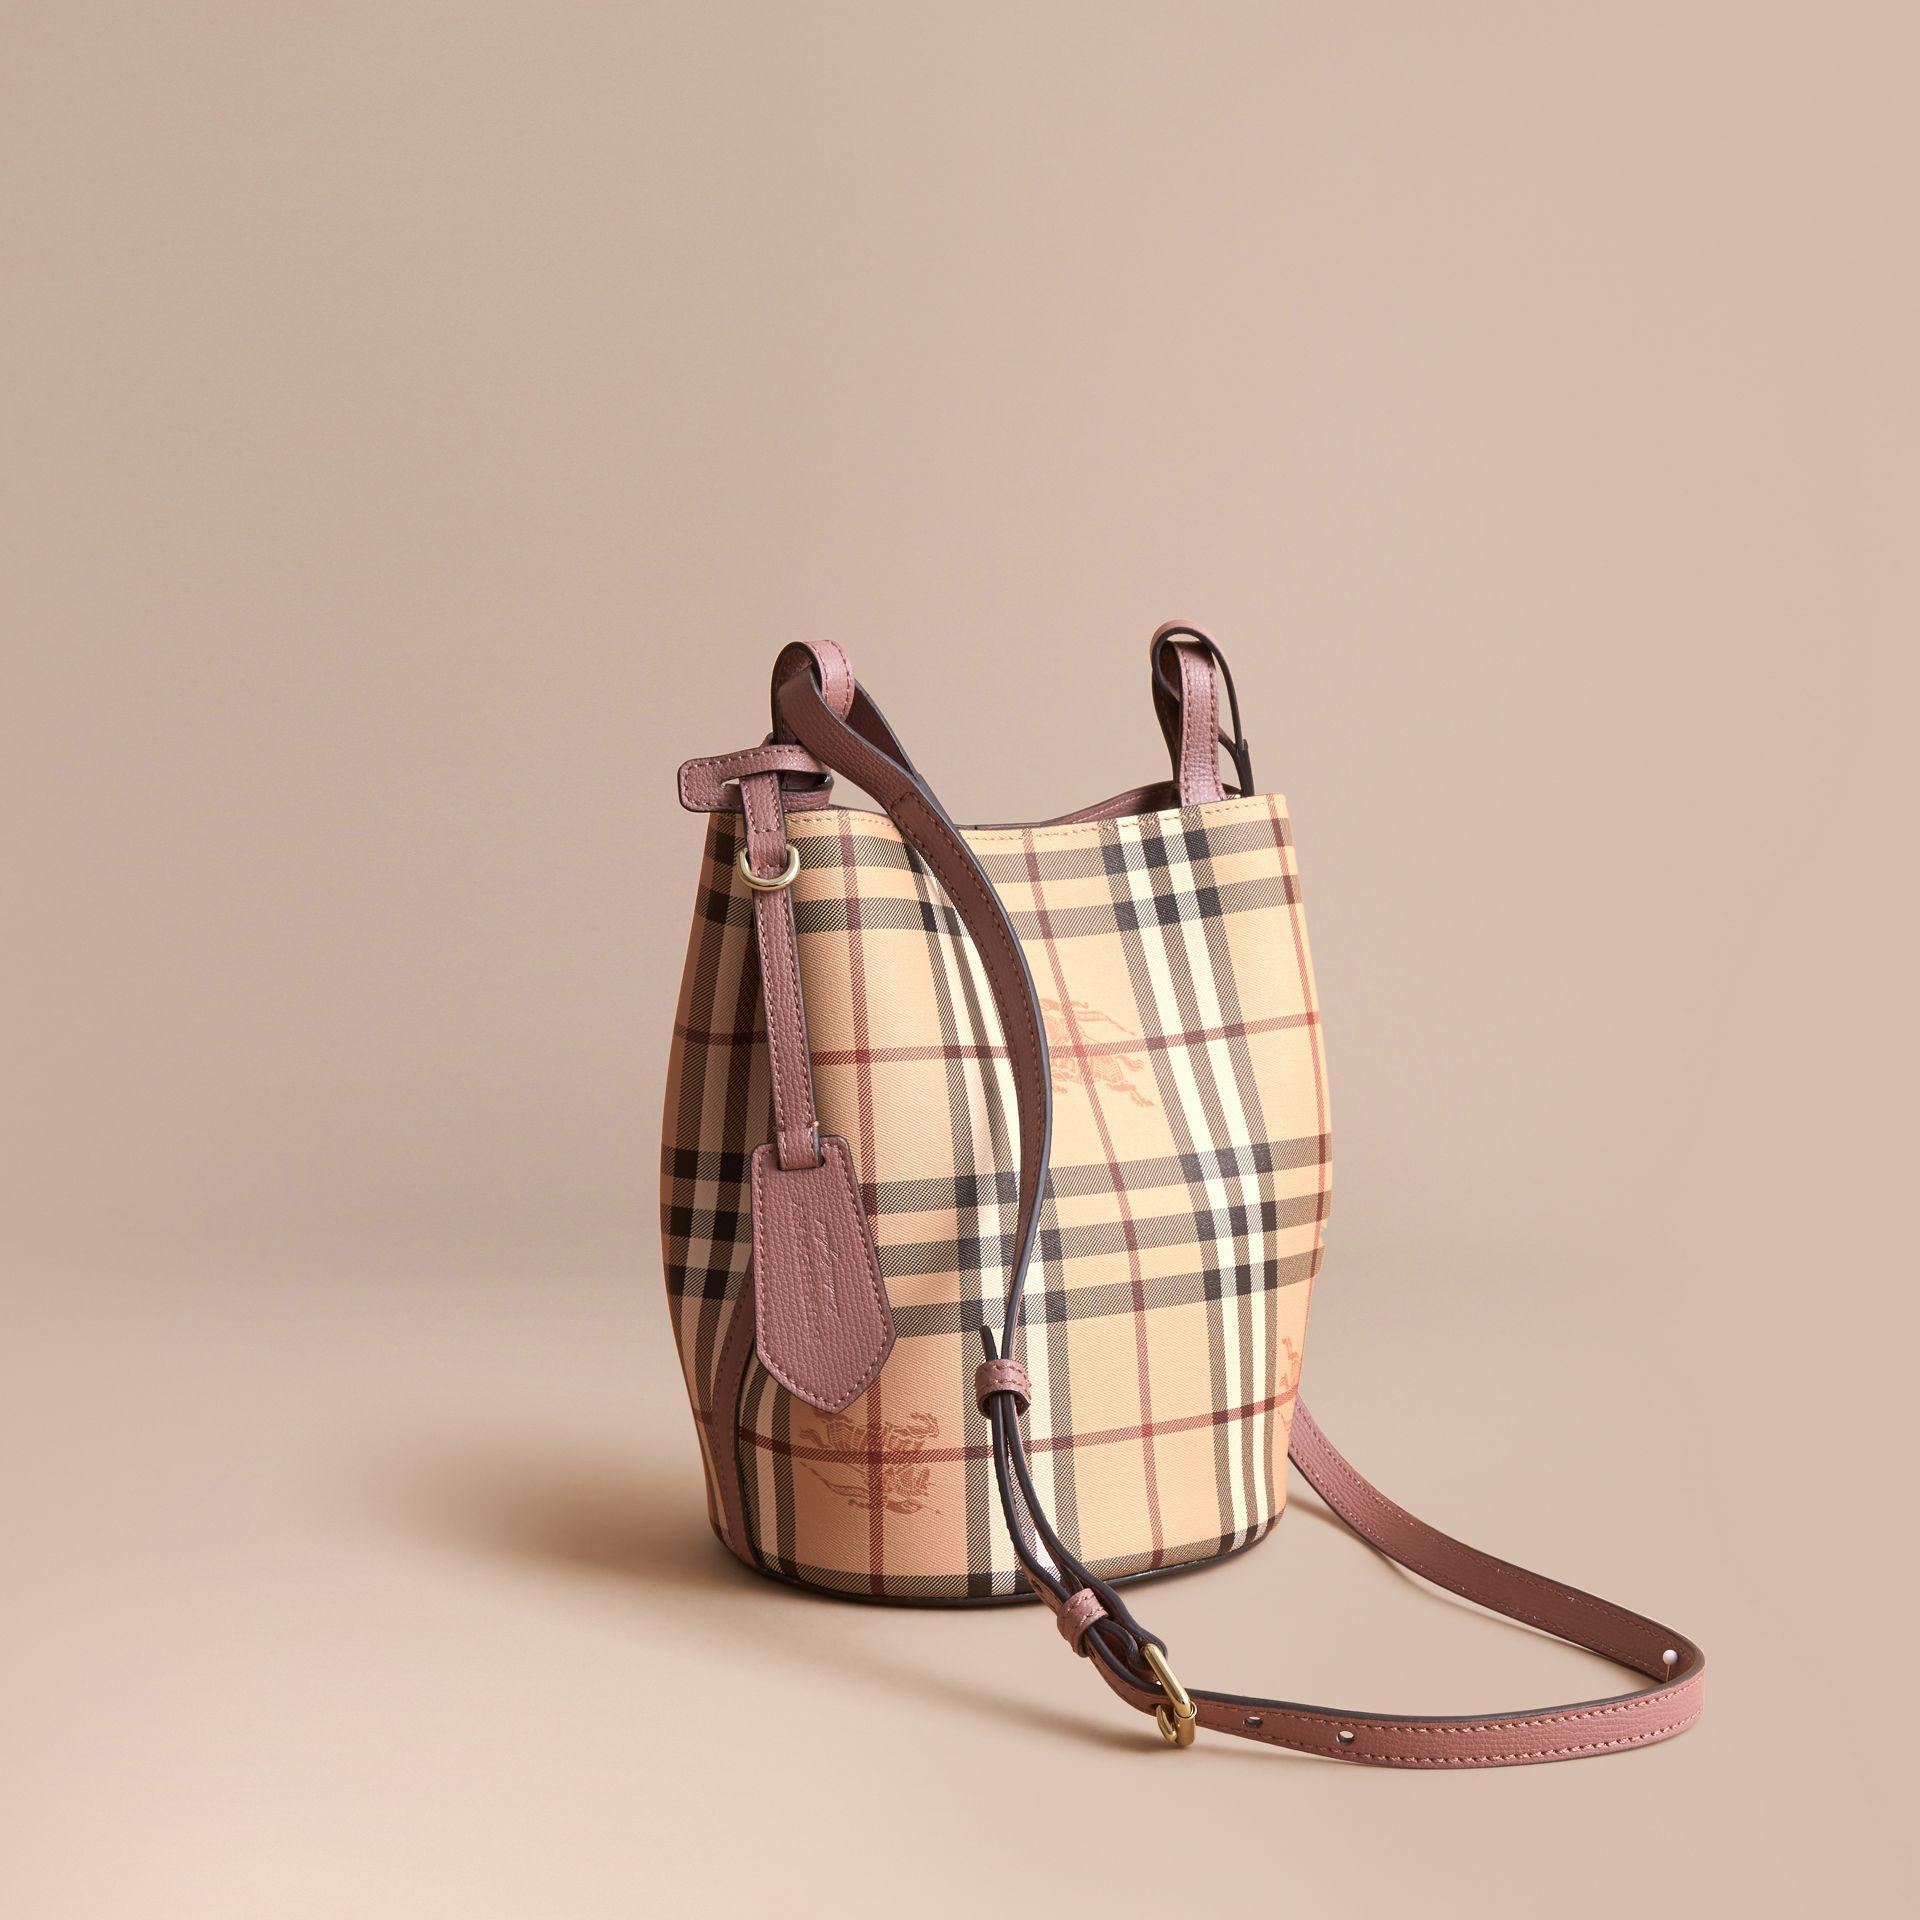 77753db0c2 Burberry Leather And Haymarket Check Crossbody Bucket Bag Light ...